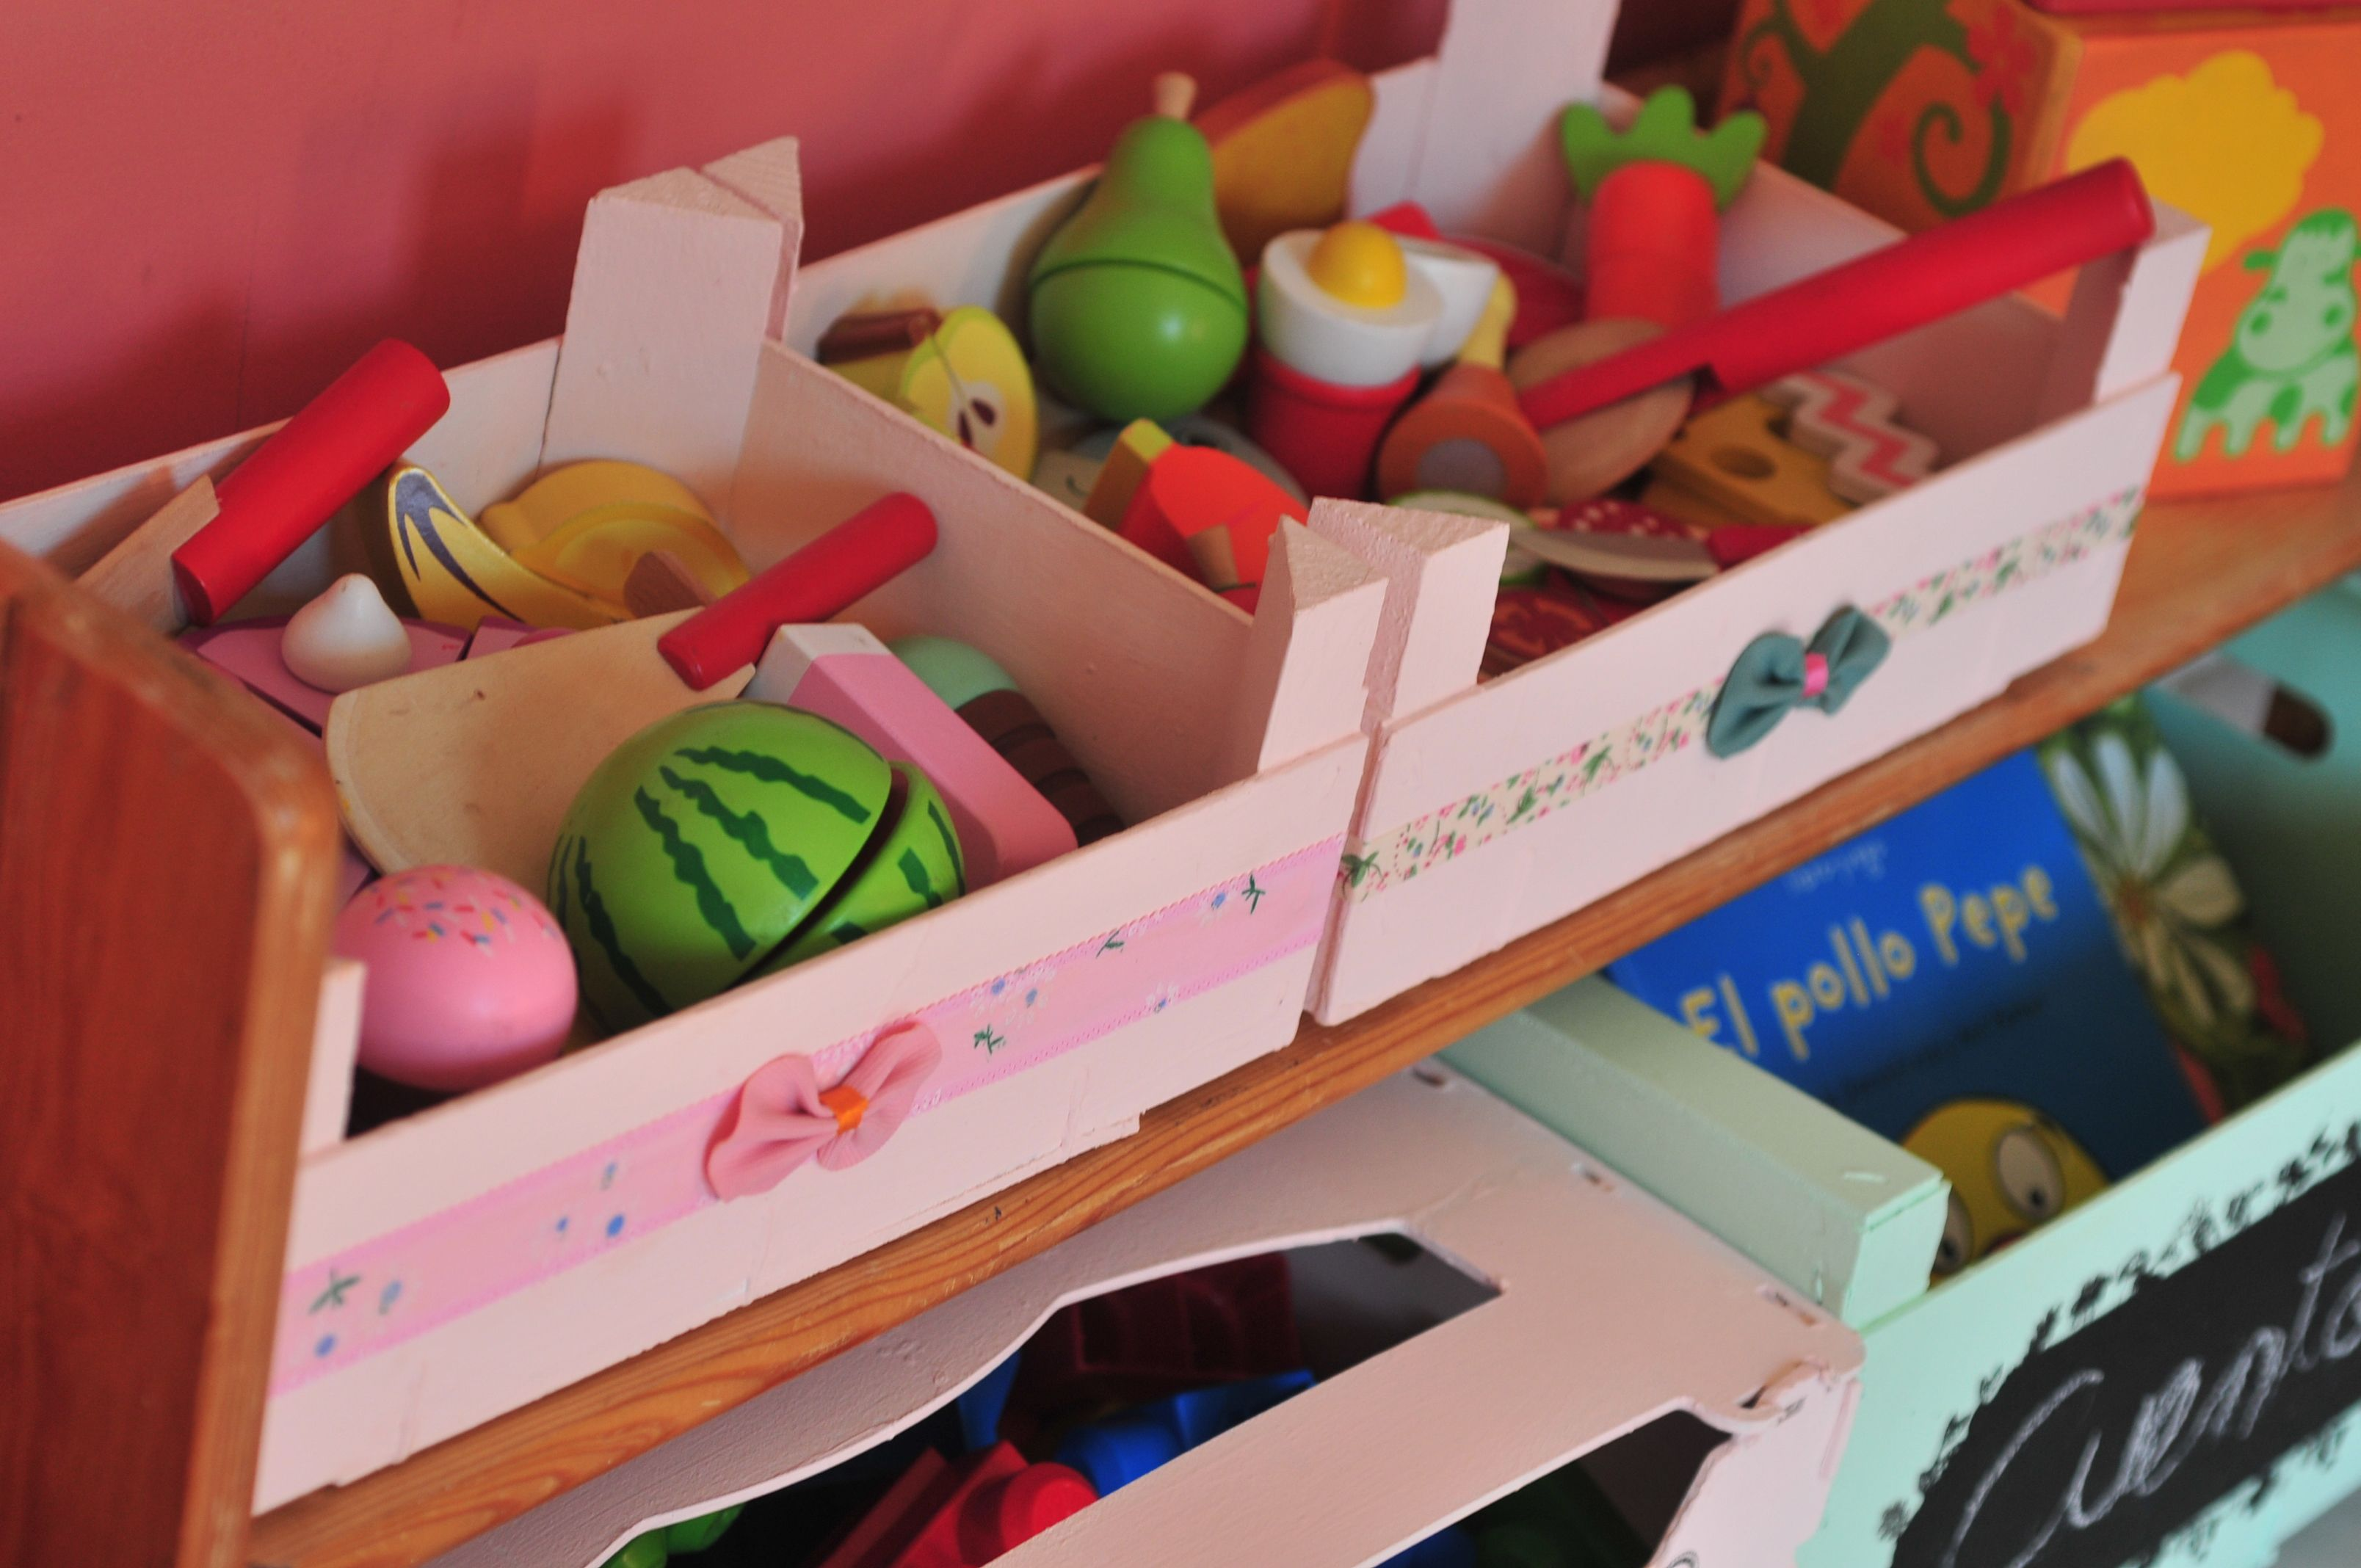 Cajas de fresas fruta madera diy reciclar cajas fresas - Caja fruta decoracion ...